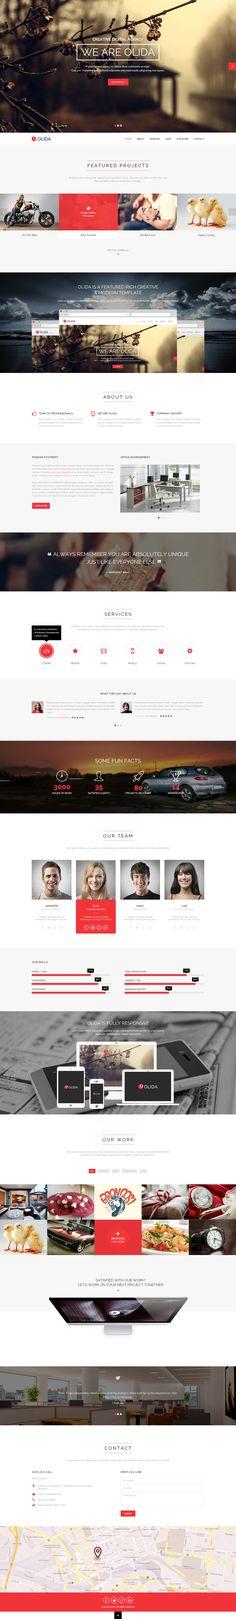 we are olida Web Design Examples, Web Ui Design, Graphic Design Branding, Page Design, Blog Layout, Website Layout, Web Layout, Layout Design, Ui Design Inspiration